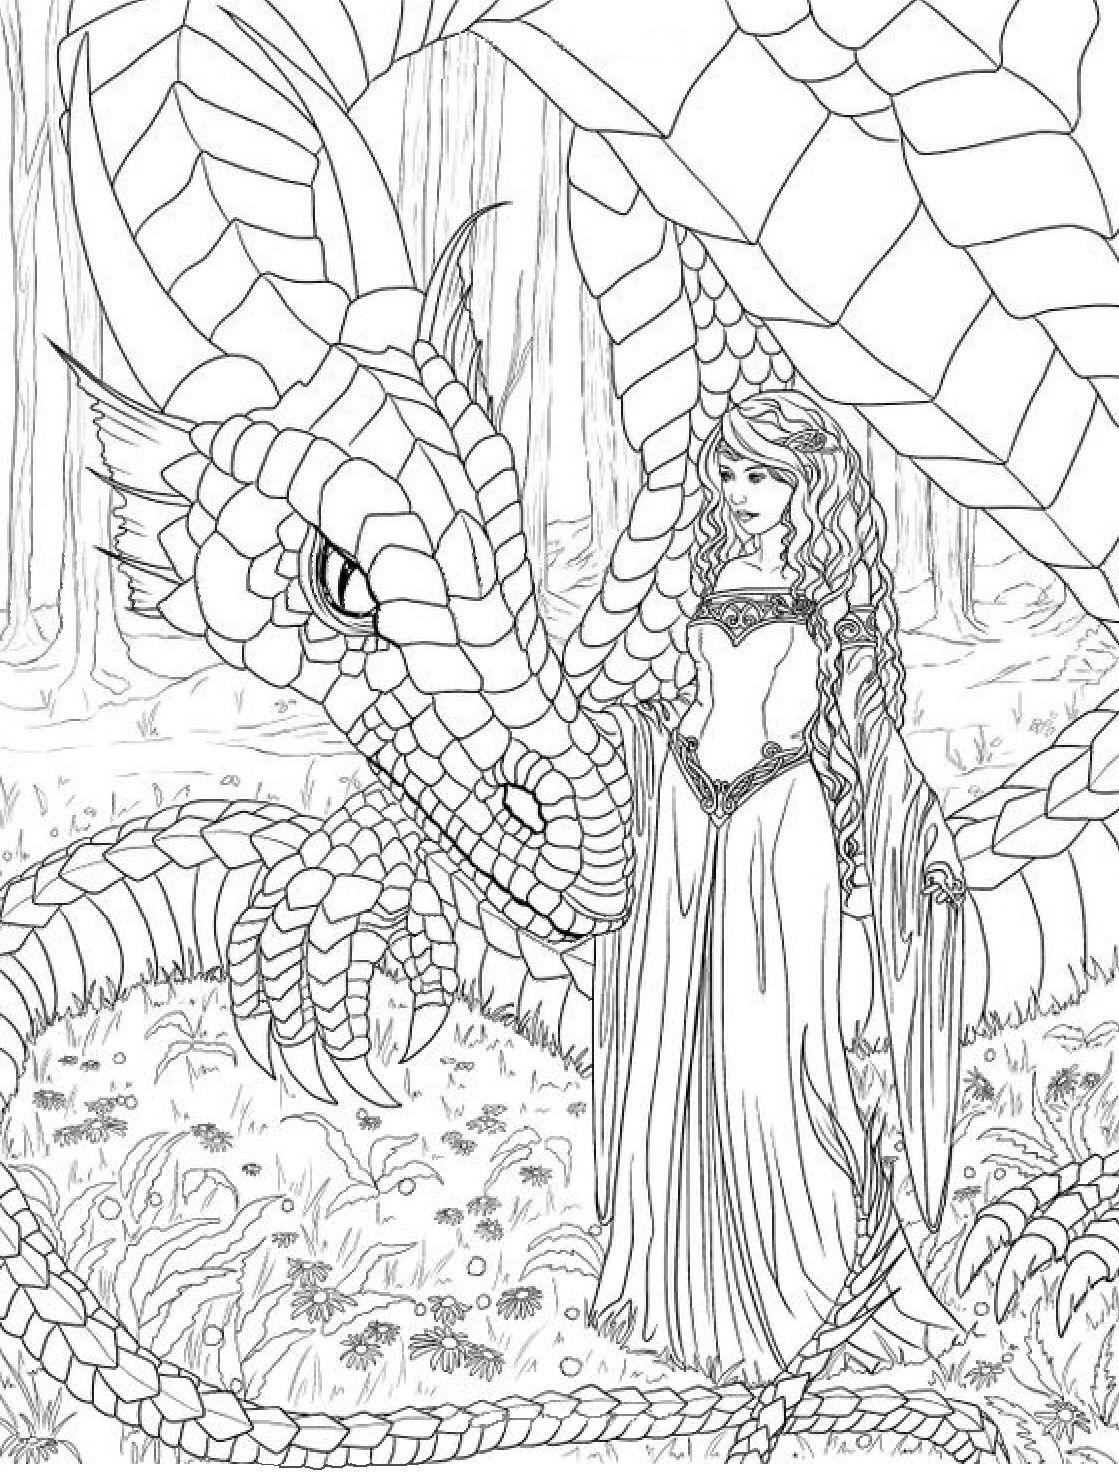 Dragon And Princess Coloring Page Dragon Coloring Page Fairy Coloring Pages Fairy Coloring